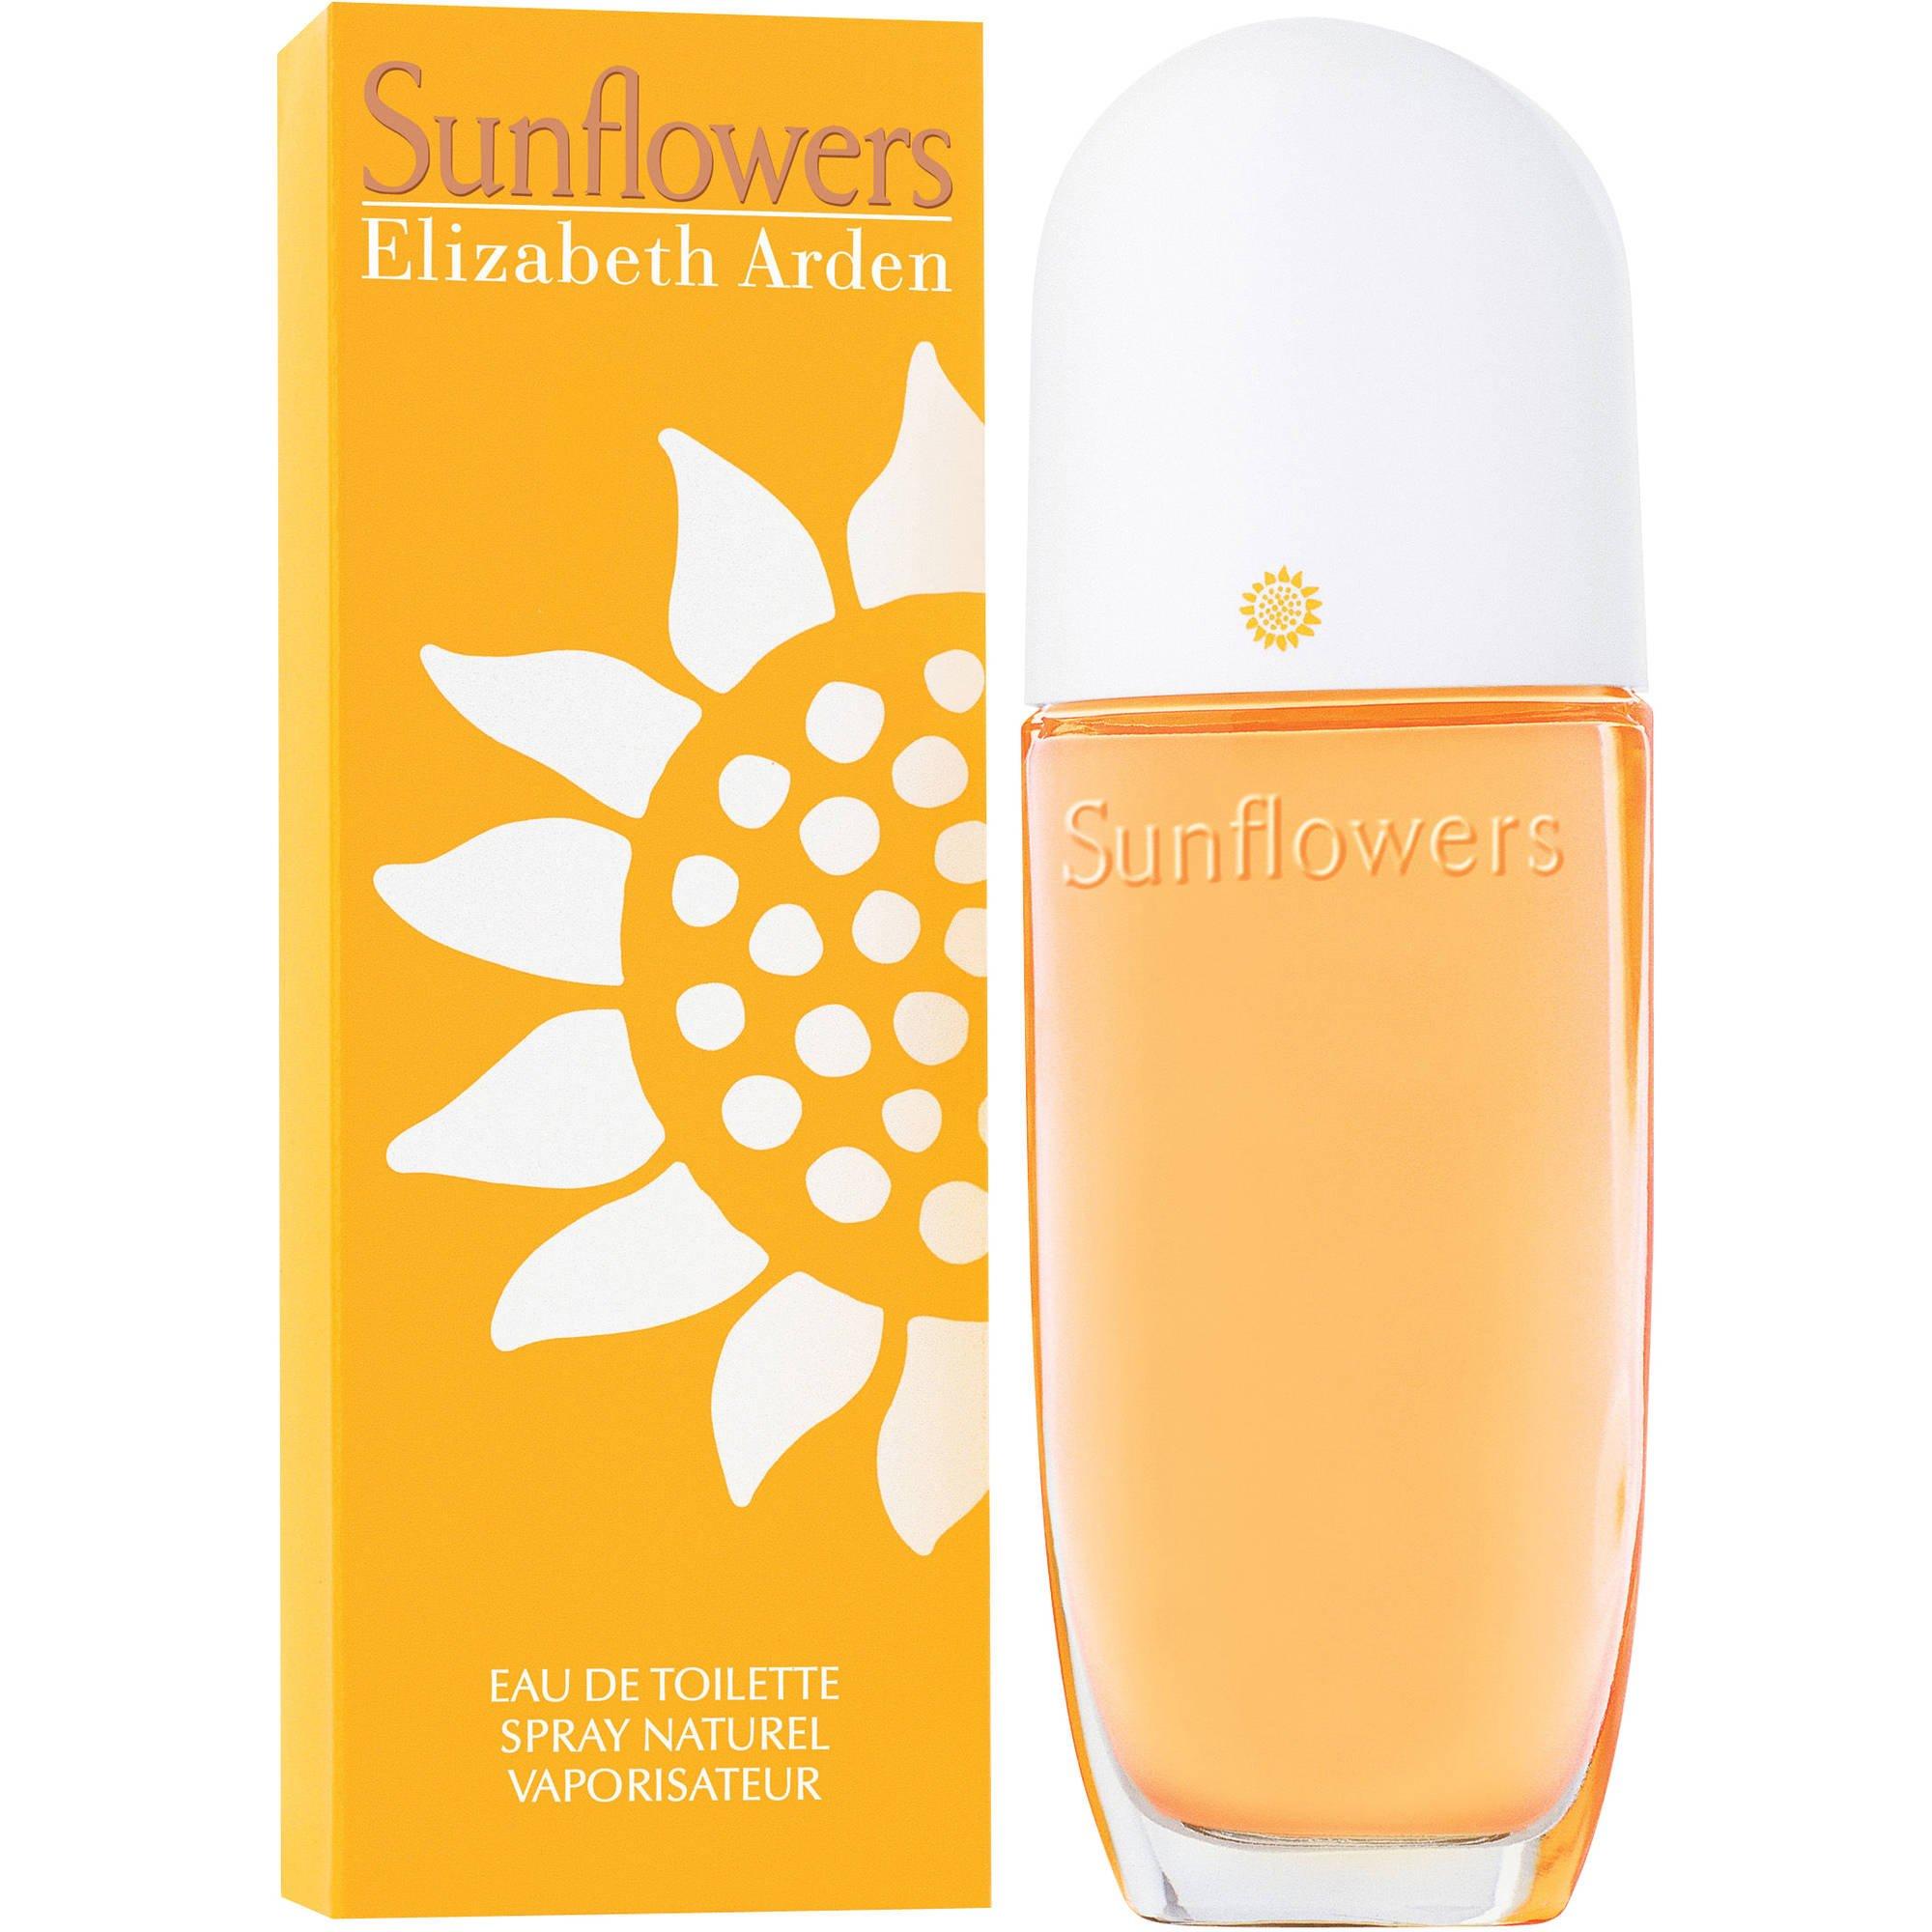 Sunflowers Sunflower Perfume 3.3 3.4 oz 100 ml Eau De Toilette Spray